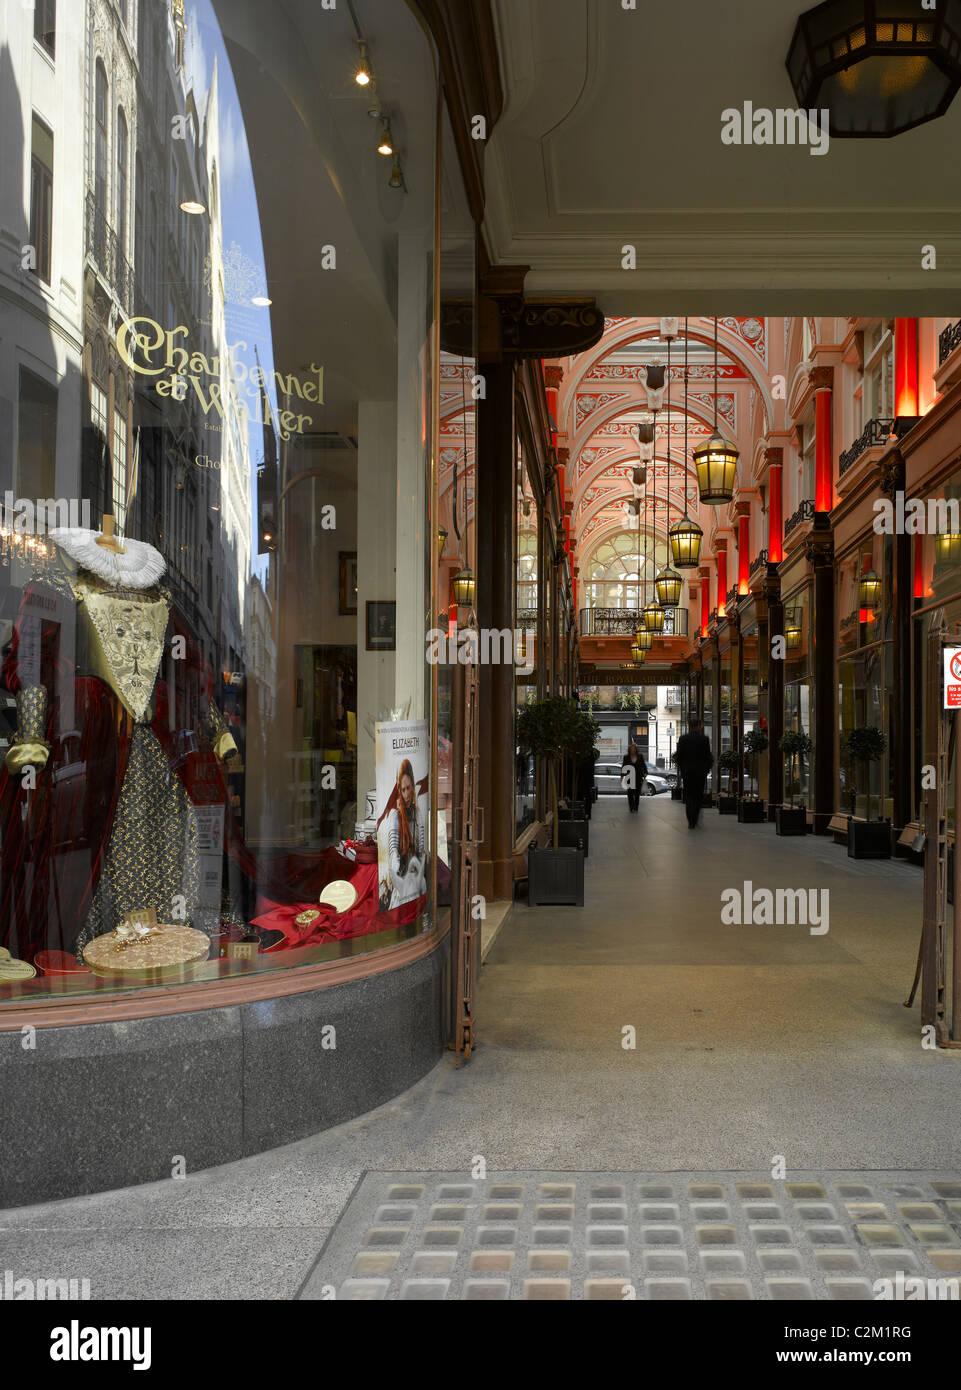 Royal Arcade, New Bond Street, Piccadilly, London. Stock Photo